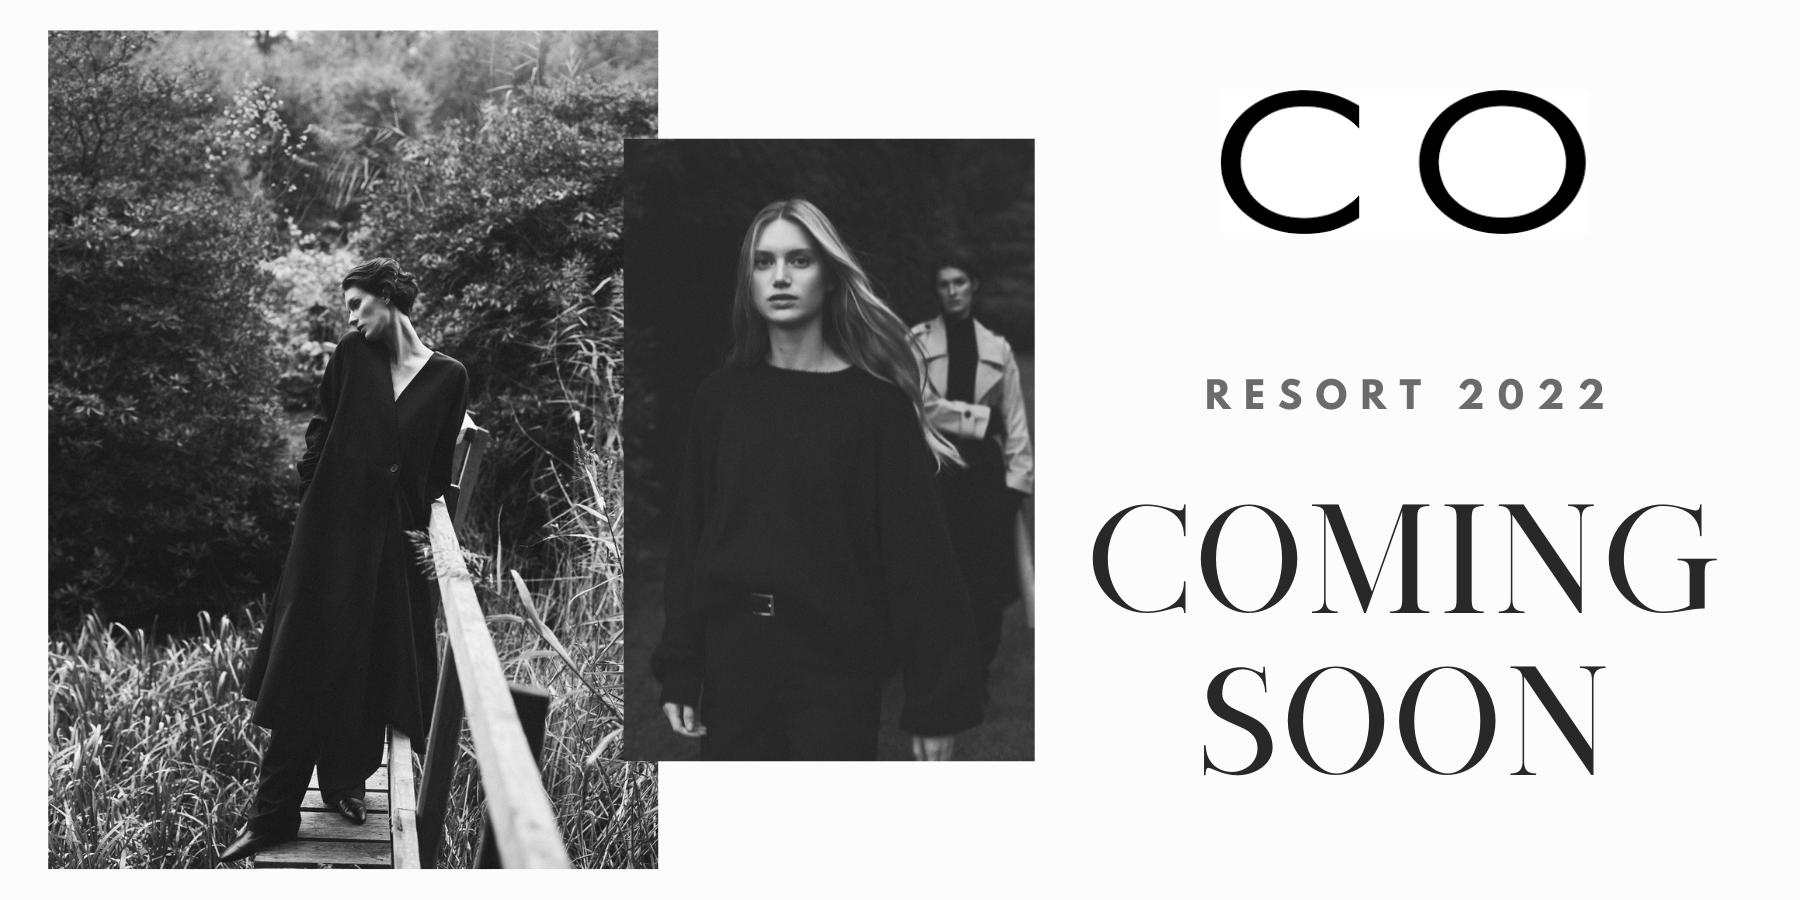 co-resort-2022-coming-soon.png